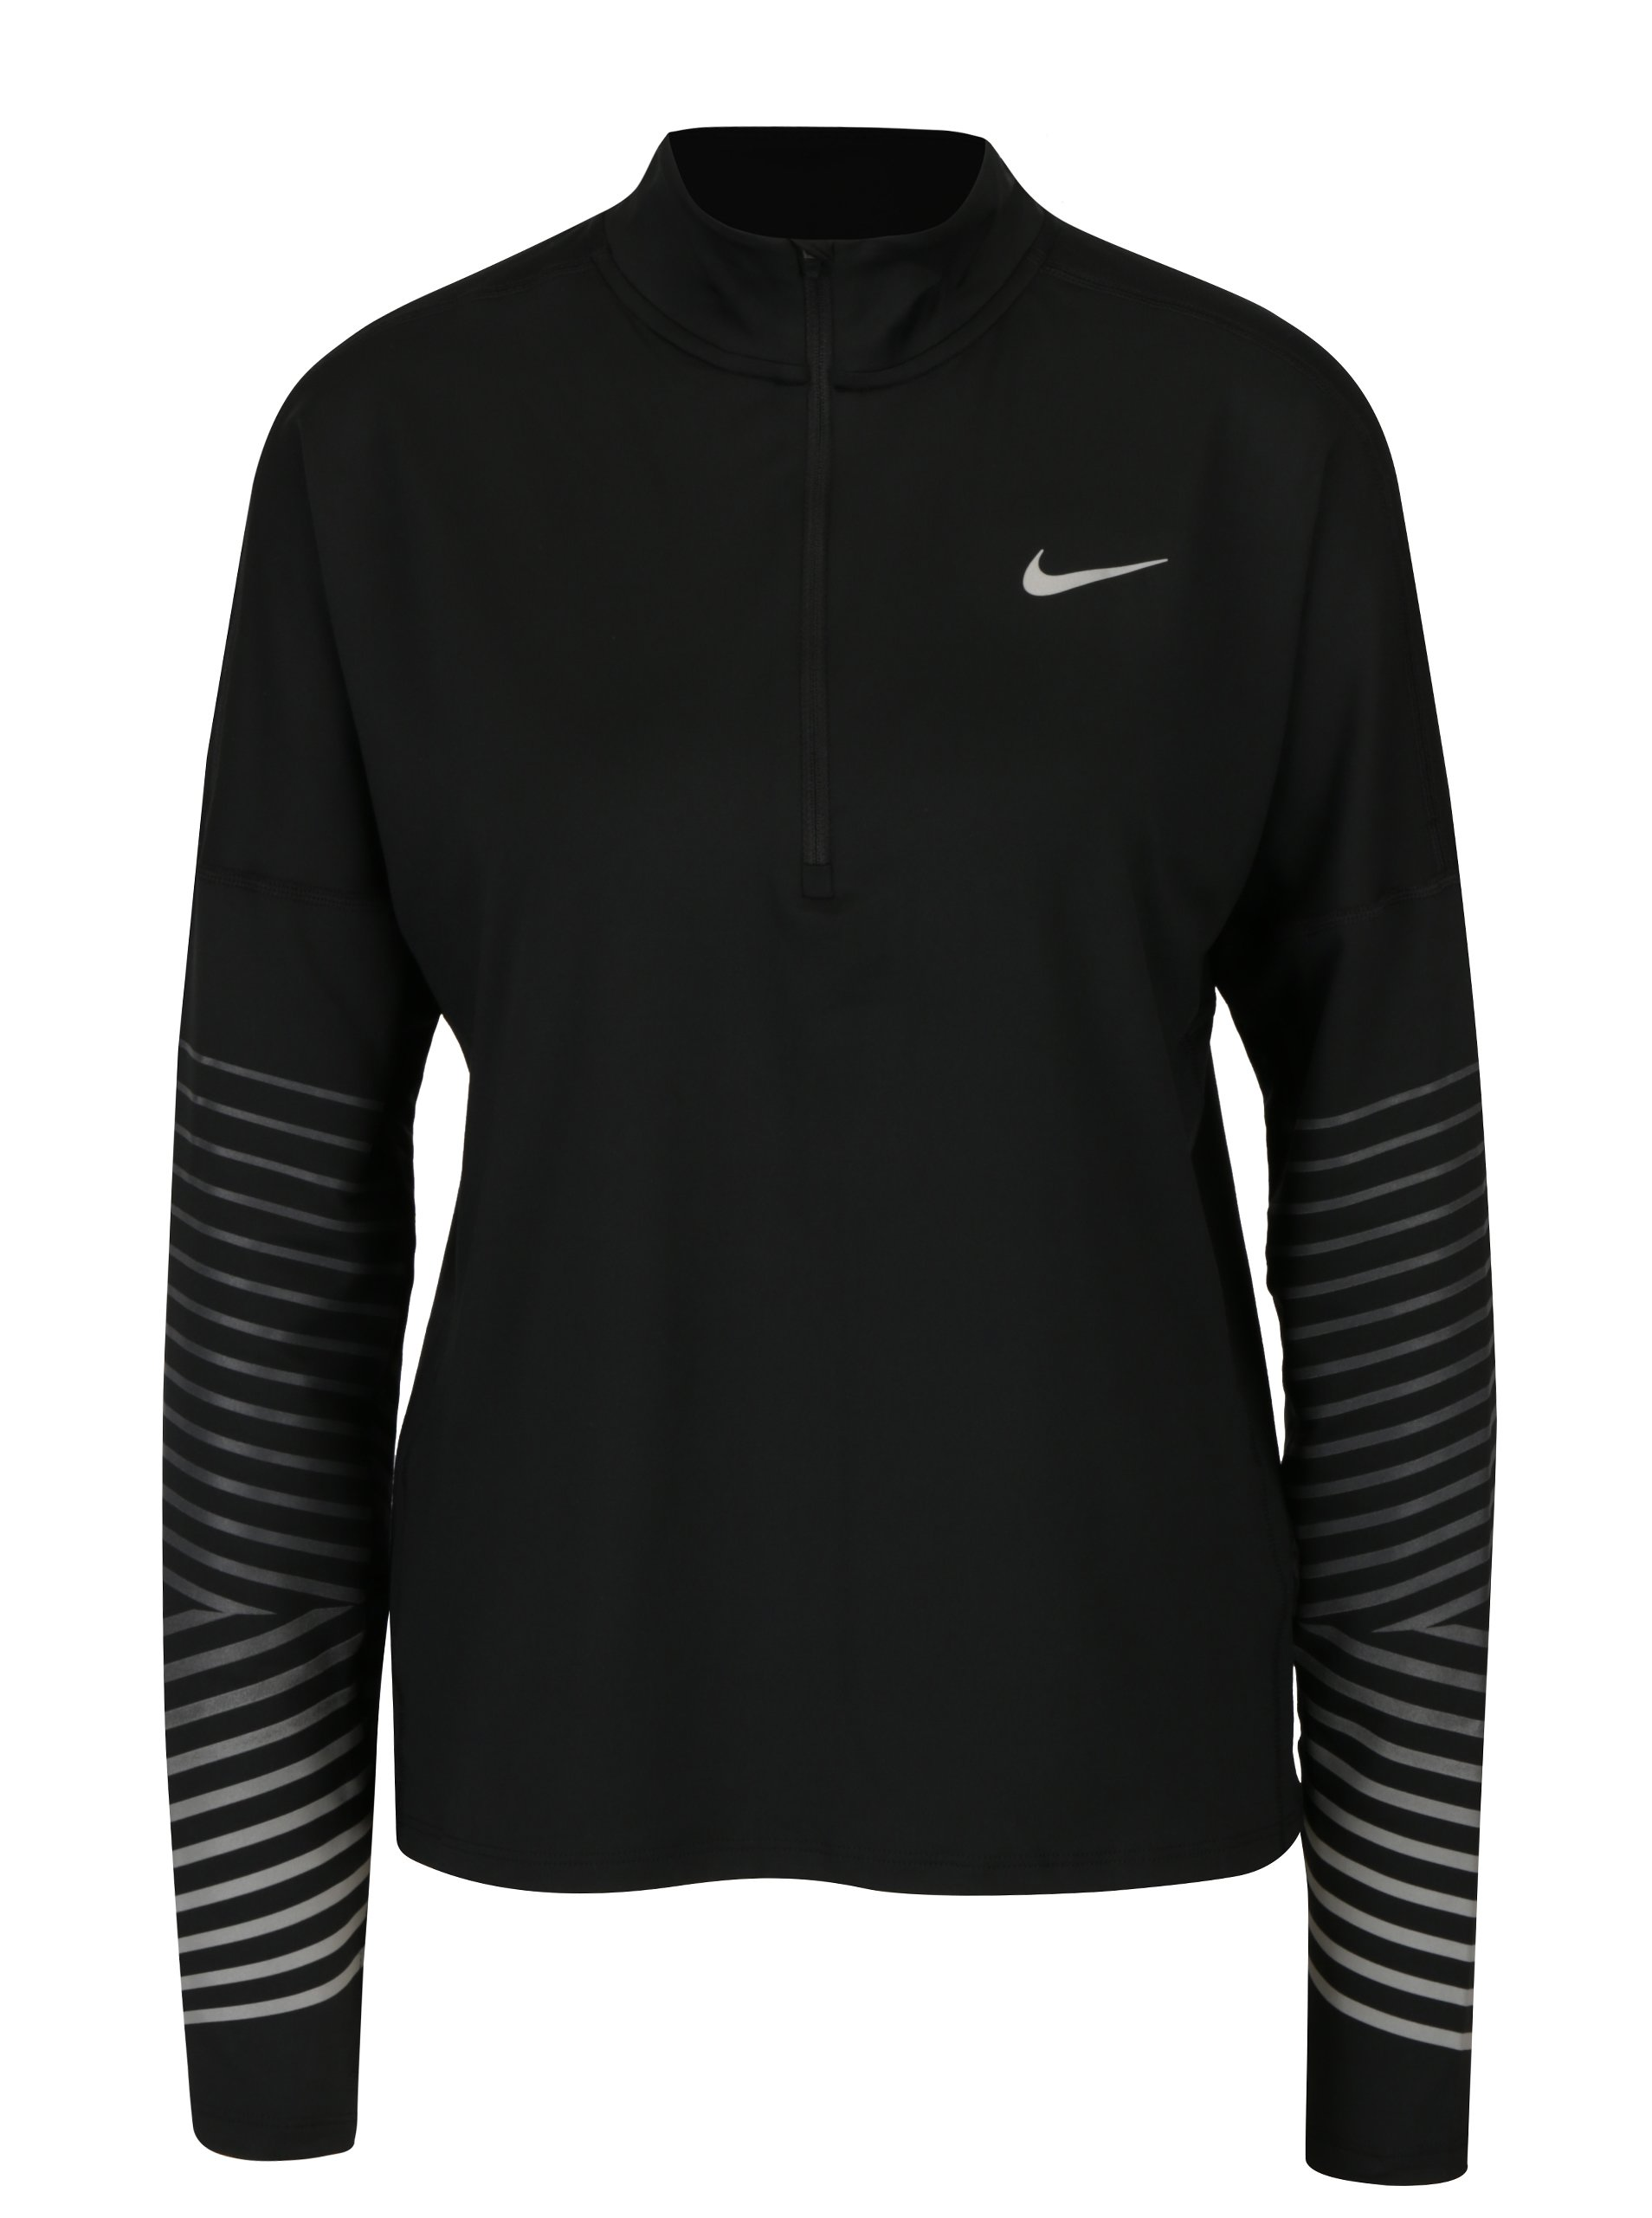 9fbdbb651994 Čierne dámske funkčné tričko s dlhým rukávom Nike Element Flash ...